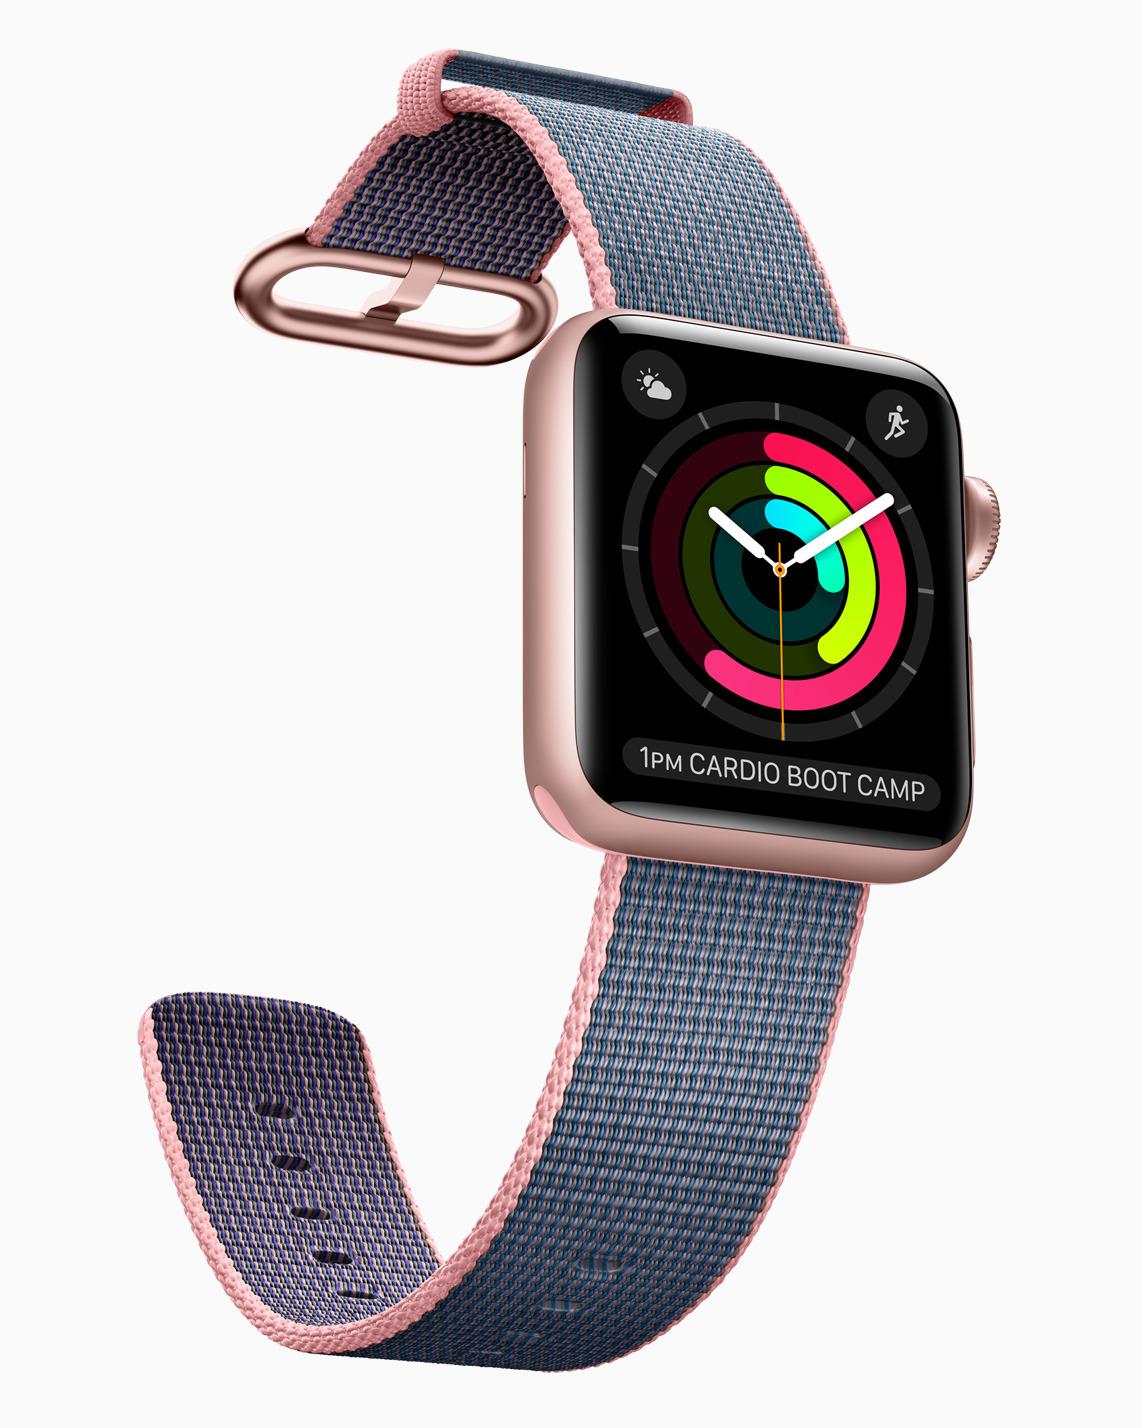 The Apple Watch Series 2